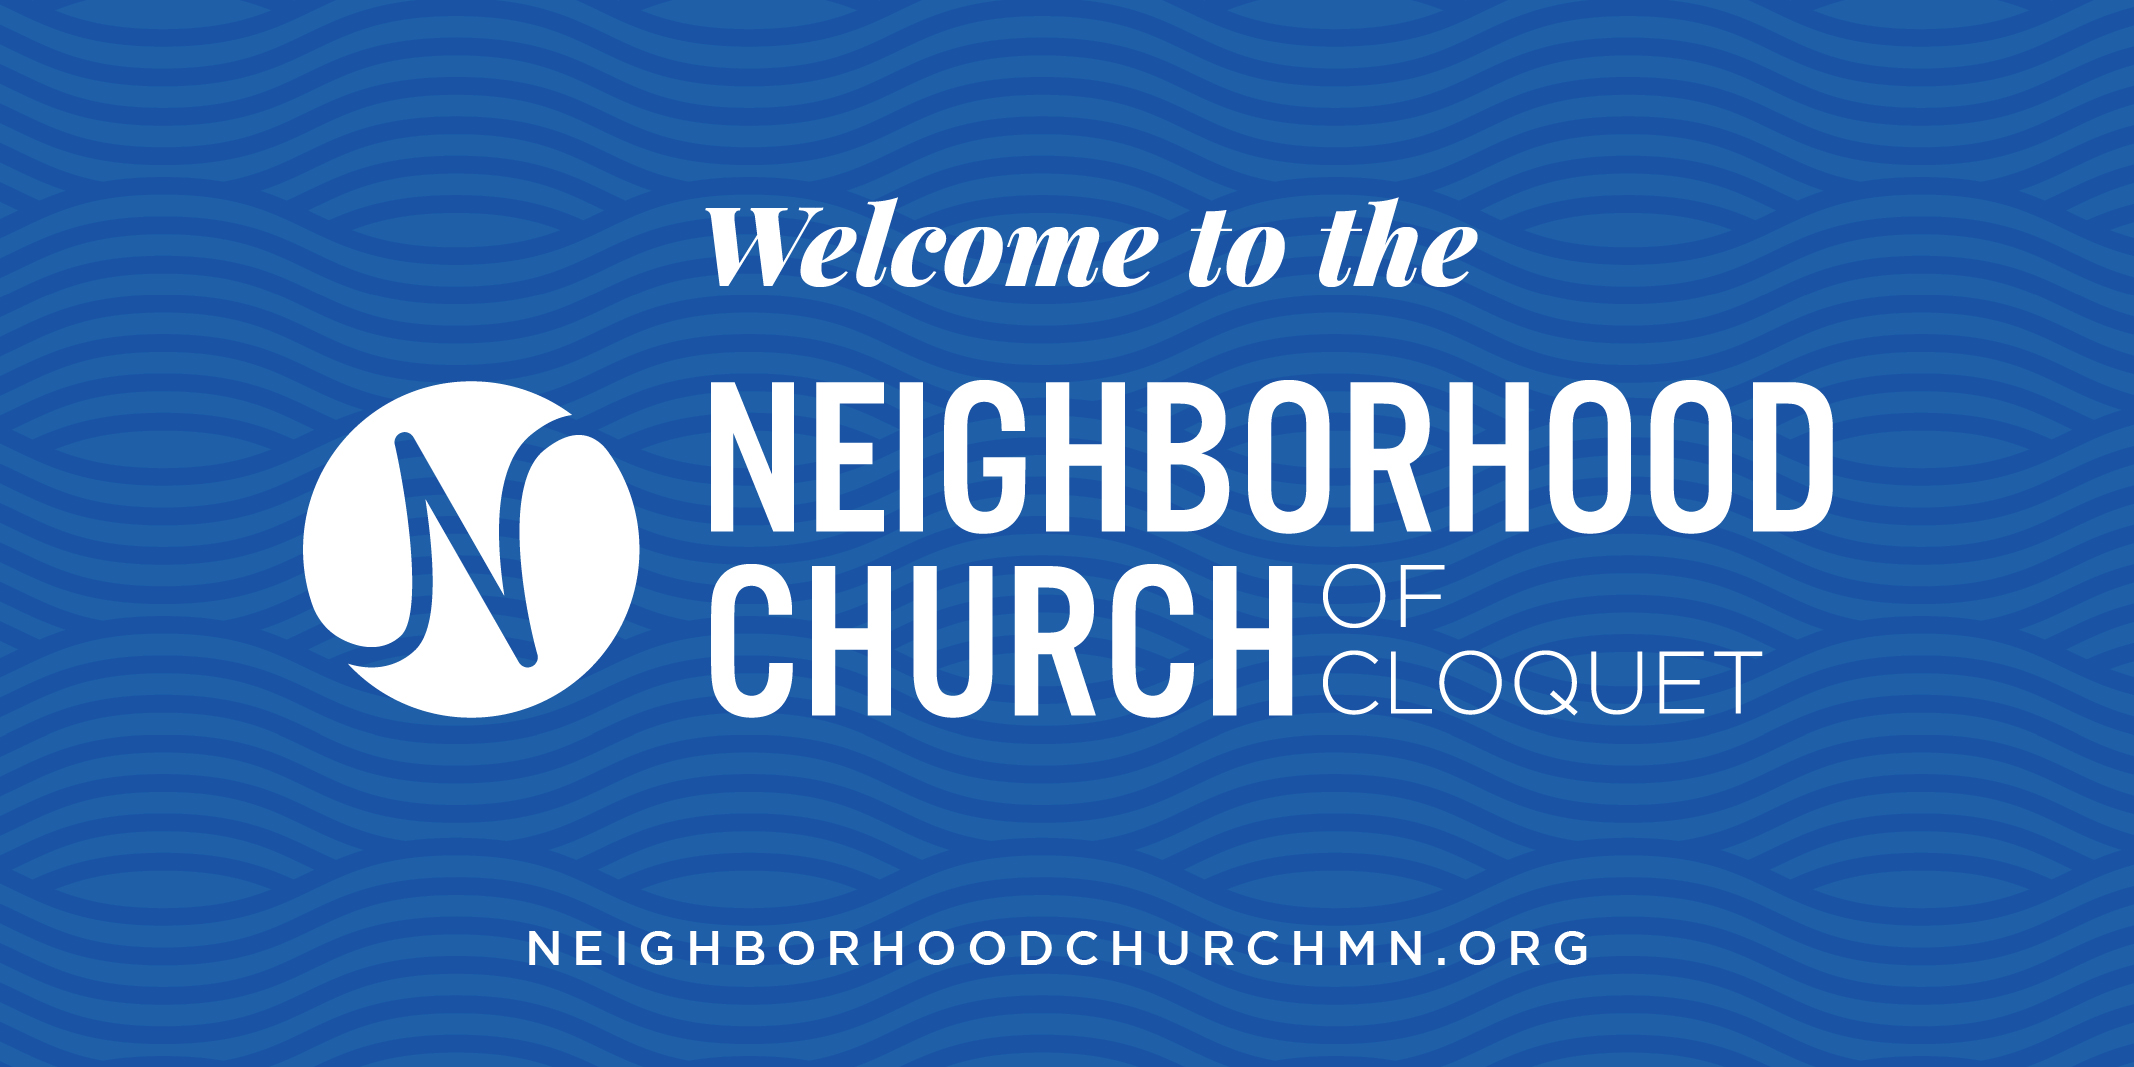 Neighborhood Church